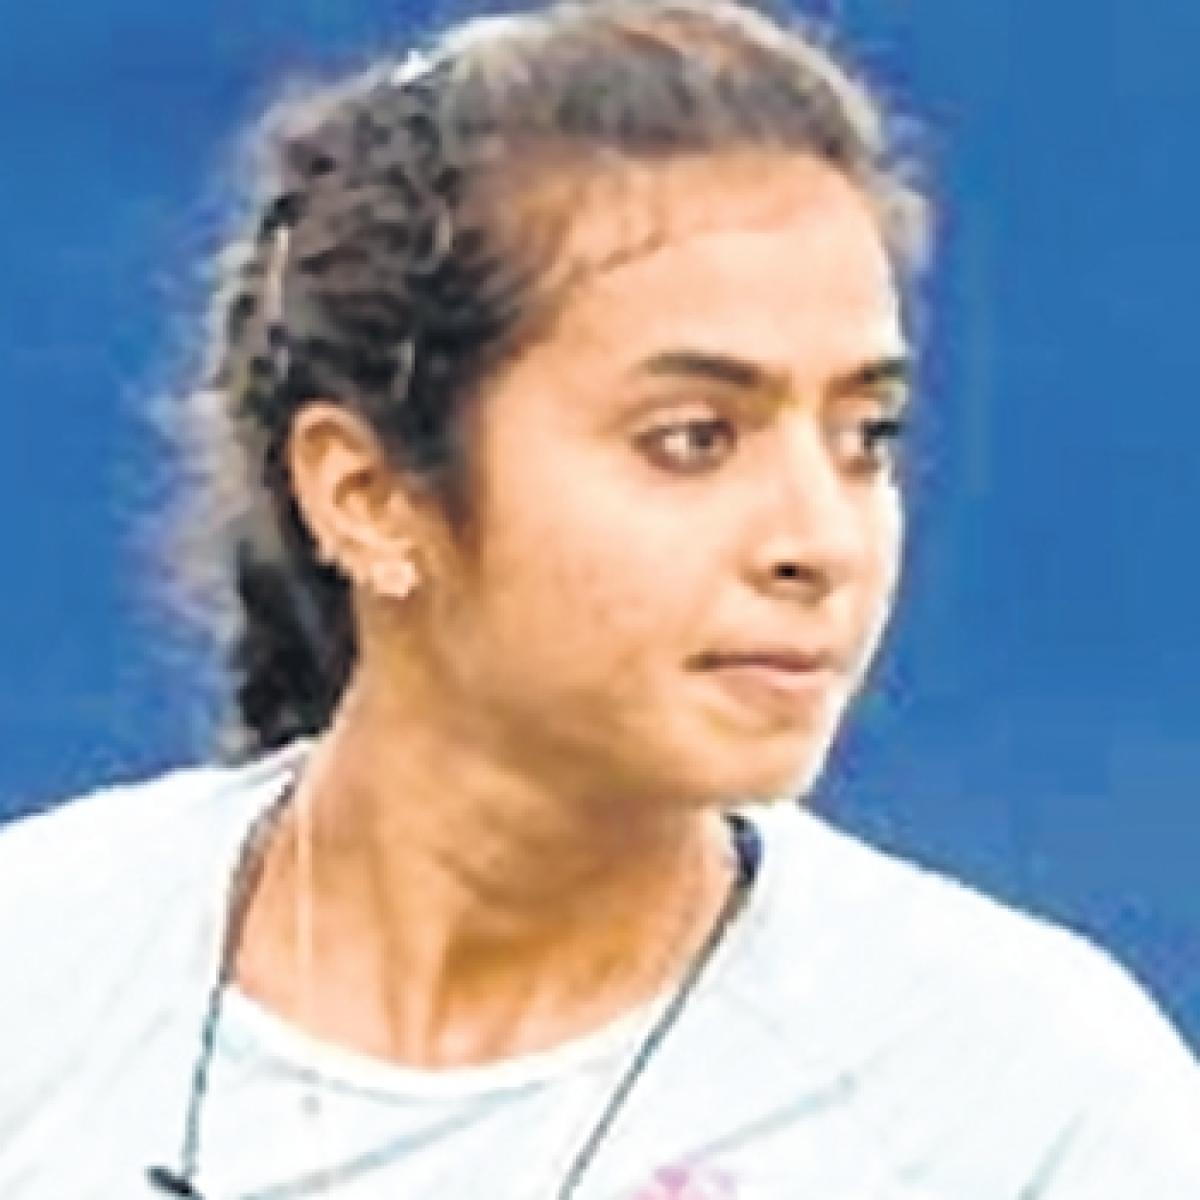 US Open Qualifiers: Ankita Raina beats Belgian Ysaline Bonaventure, closer to main draw